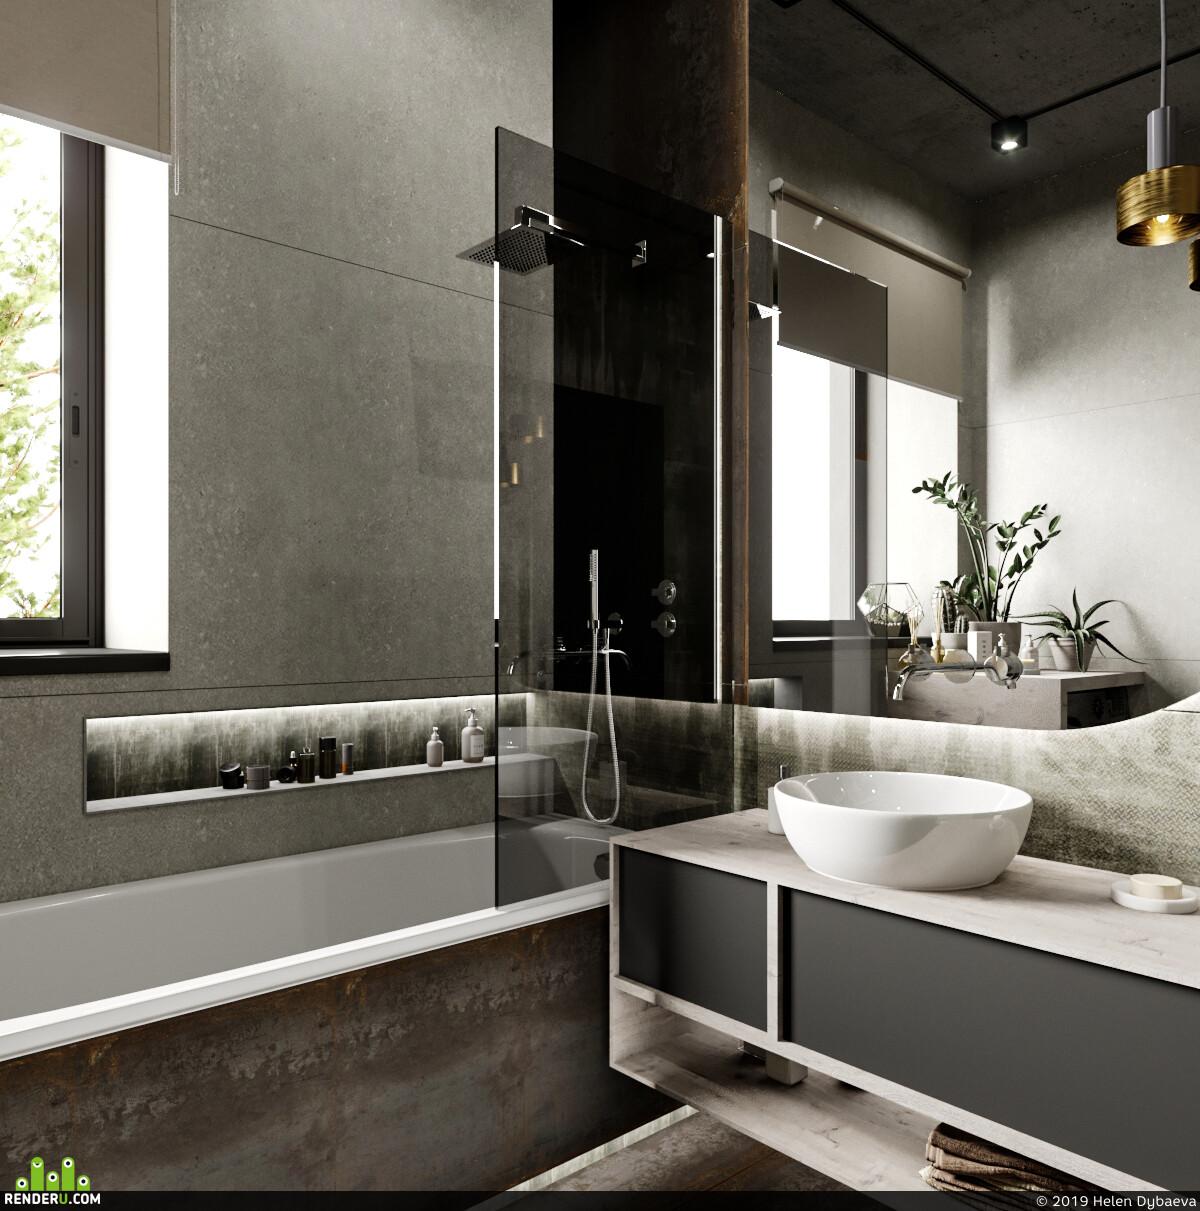 интерьер, interior interior design design 3D 3D Studio Max 3D архитектура интерьер дизайн интерьера интерьер, visualization, санузлы, санузел